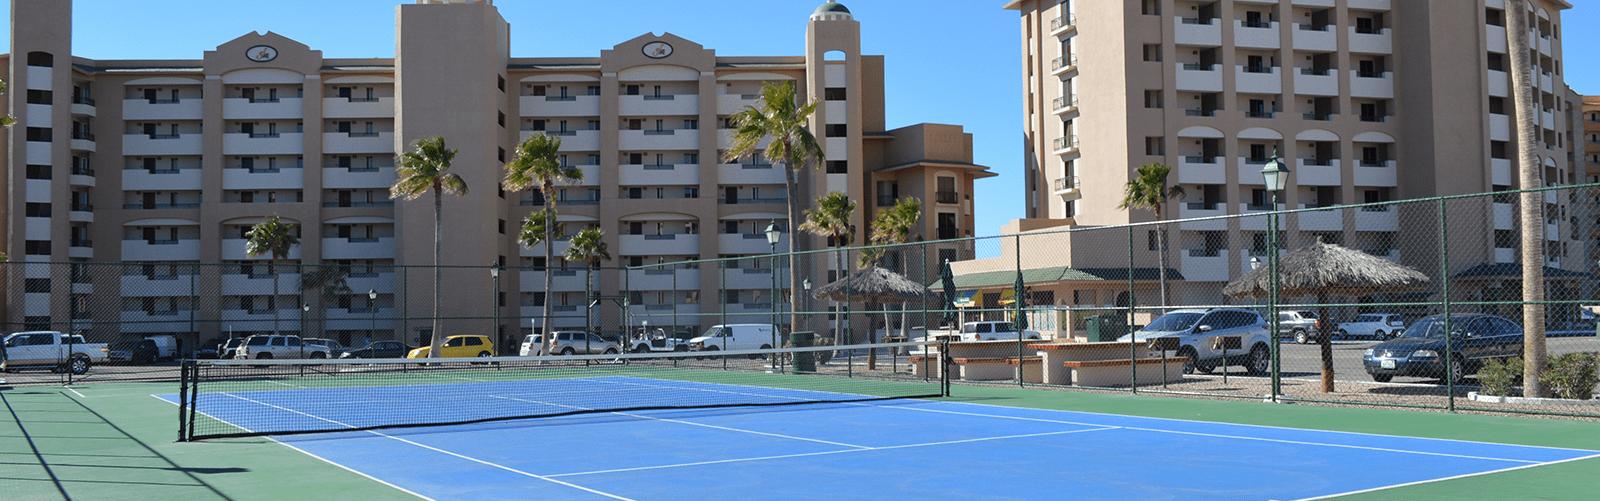 Tennis-Court-sonoran-spa-puerto-penasco-rentals